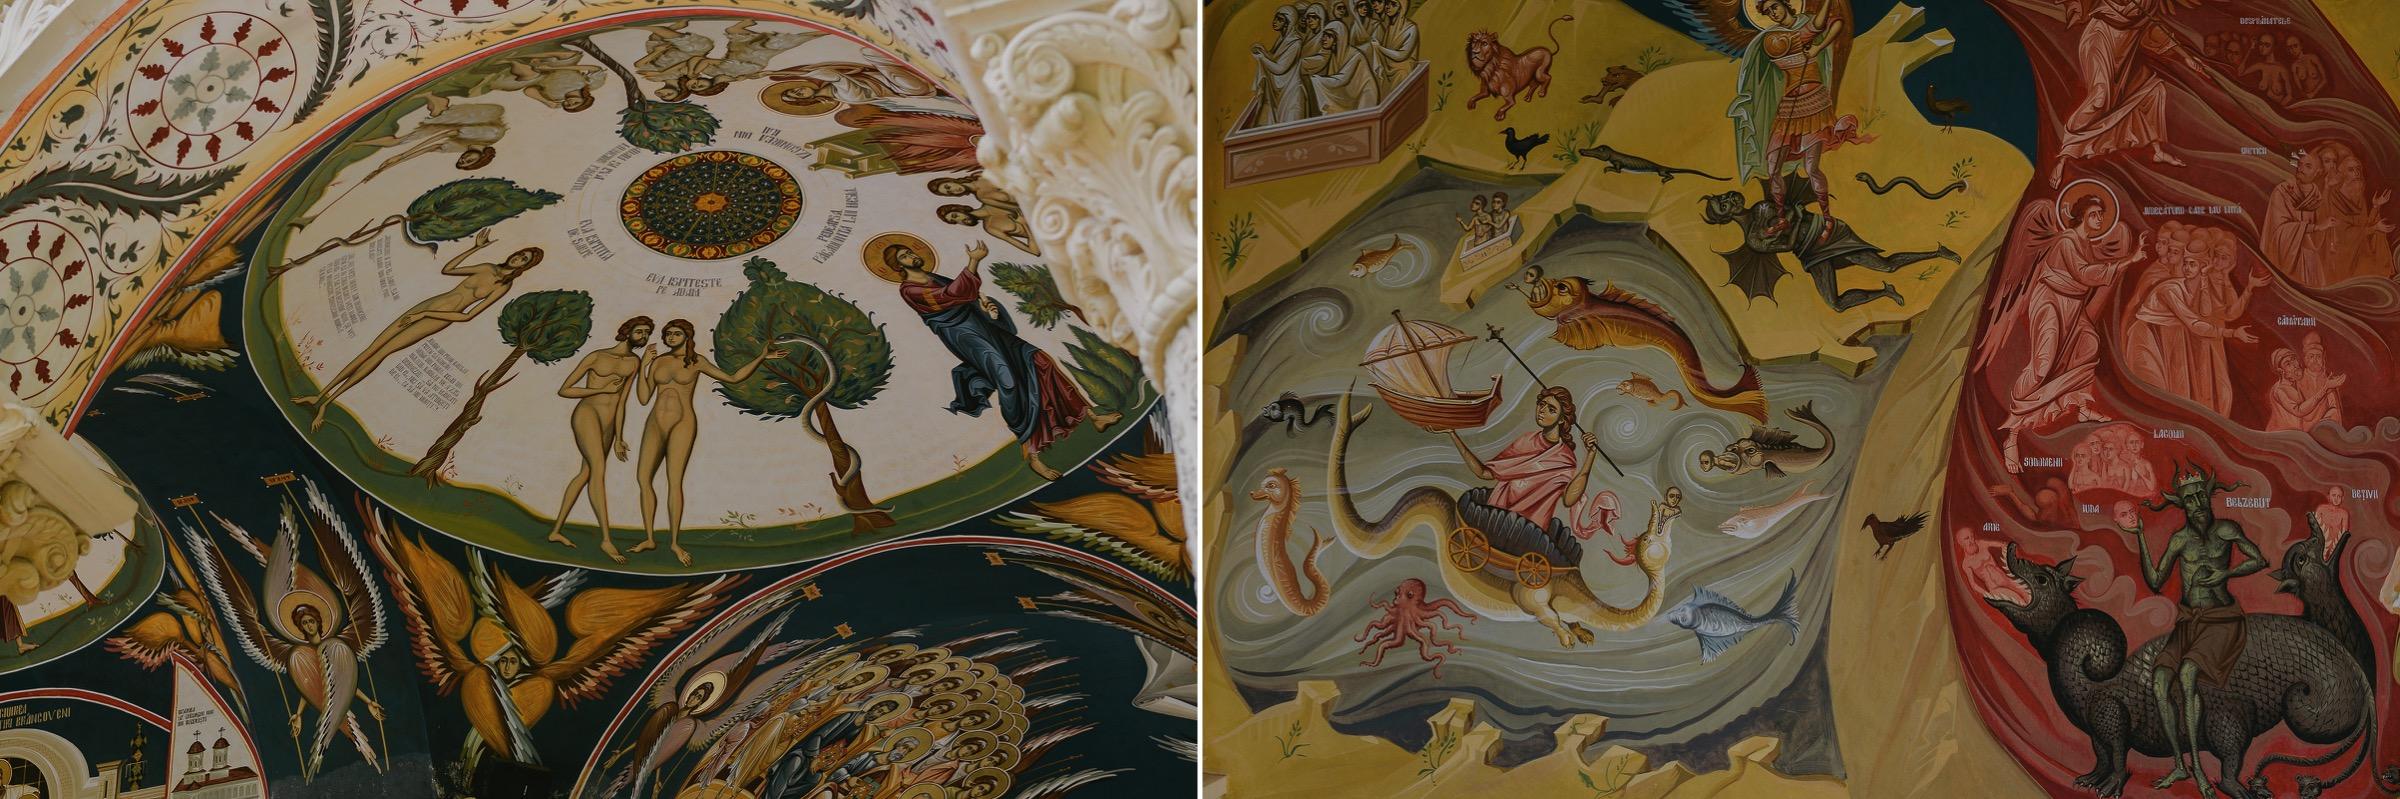 biserica ortodoxa bucuresti